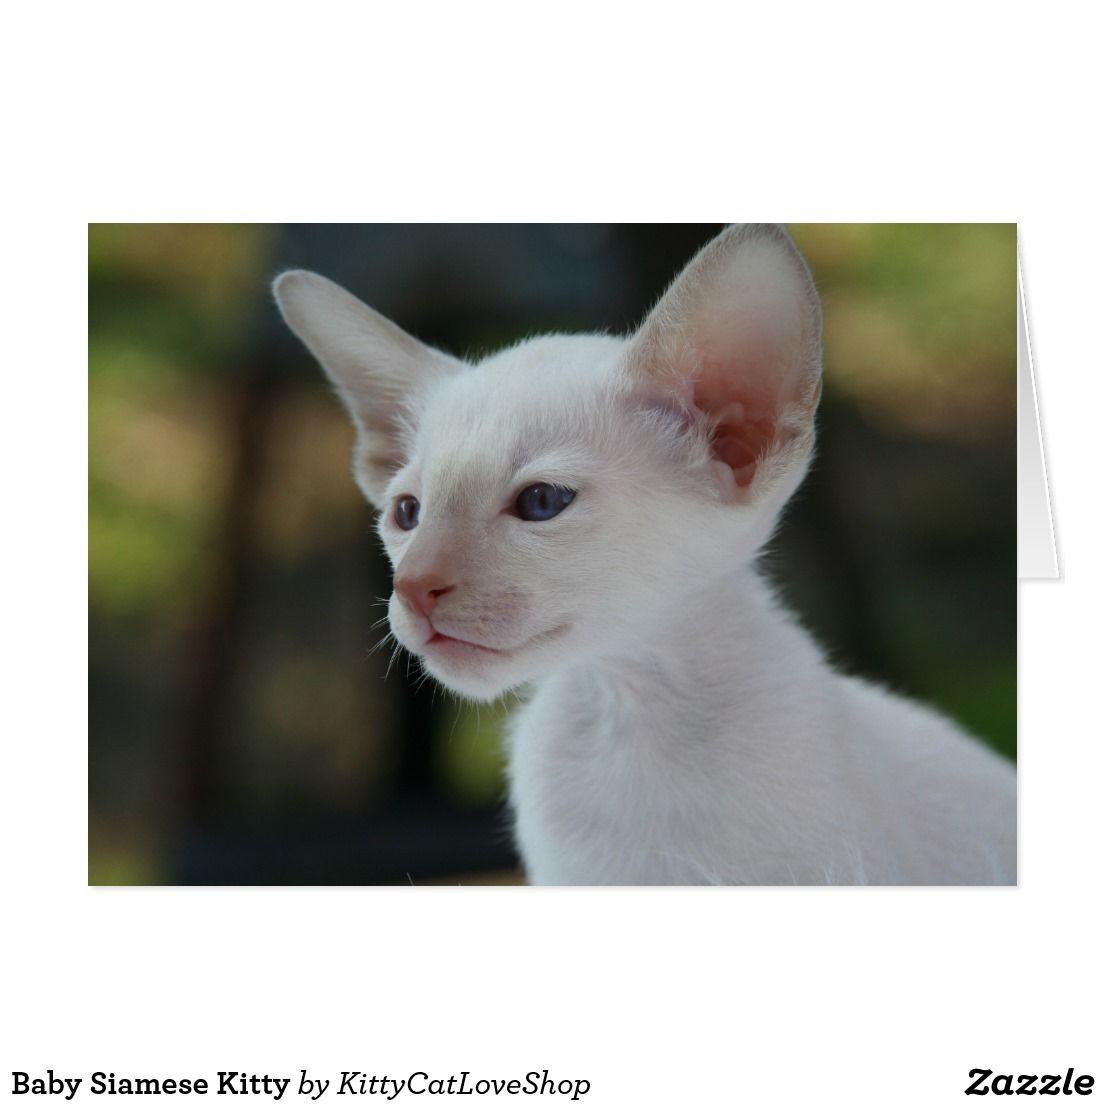 How to Get Rid of Fleas Cat fleas, Fleas on kittens, Dog